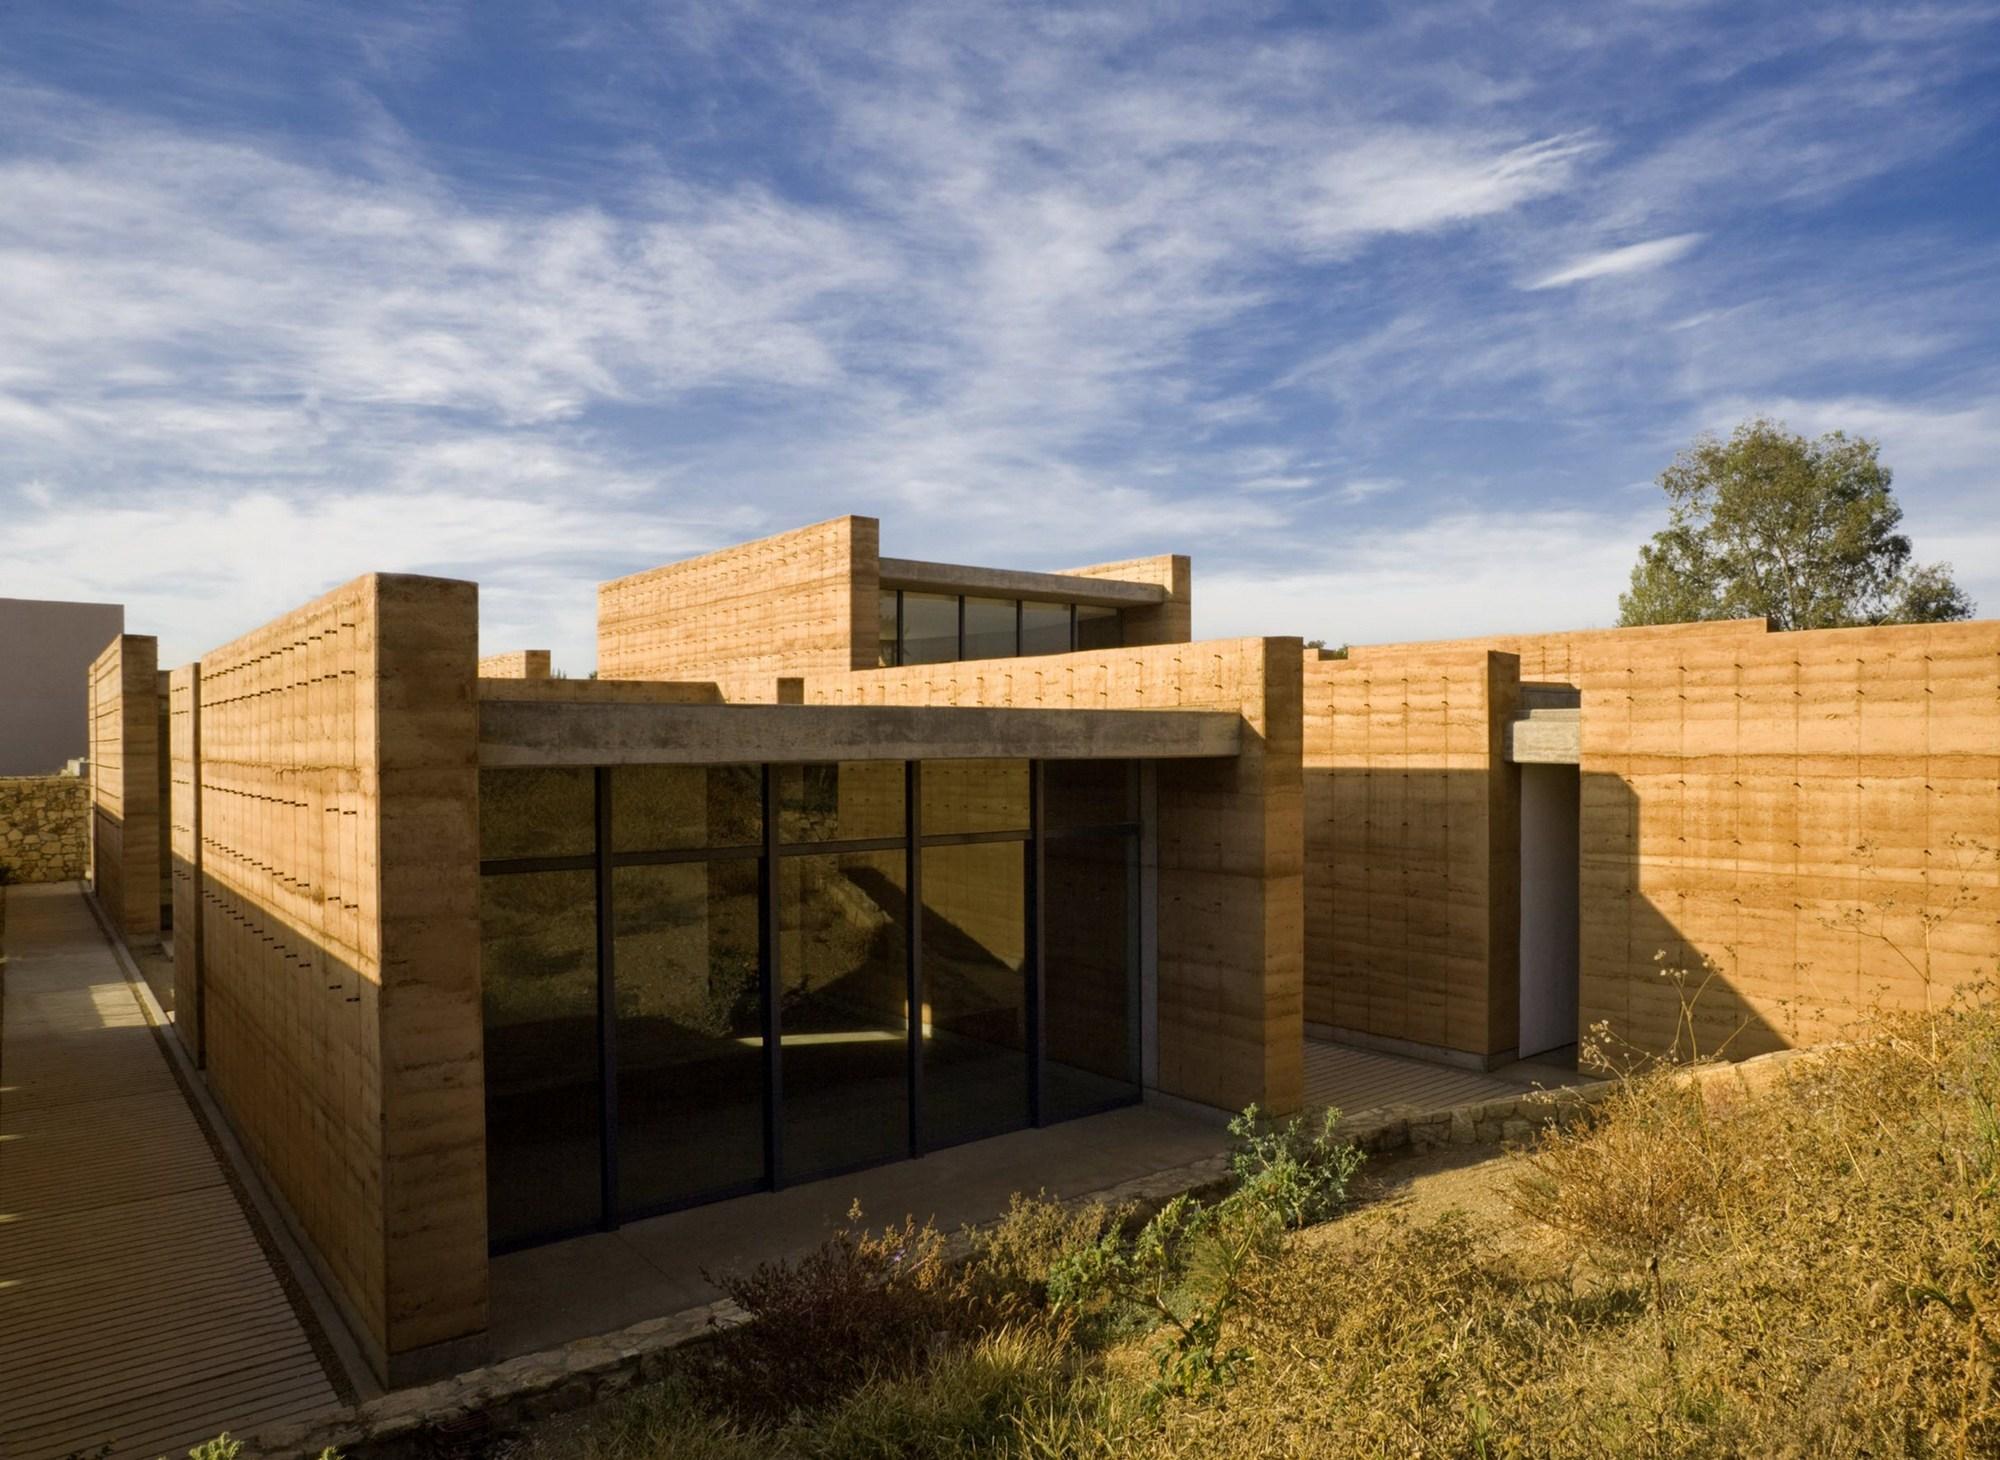 Escuela de artes visuales de oaxaca taller de for Arquitectura de proyectos